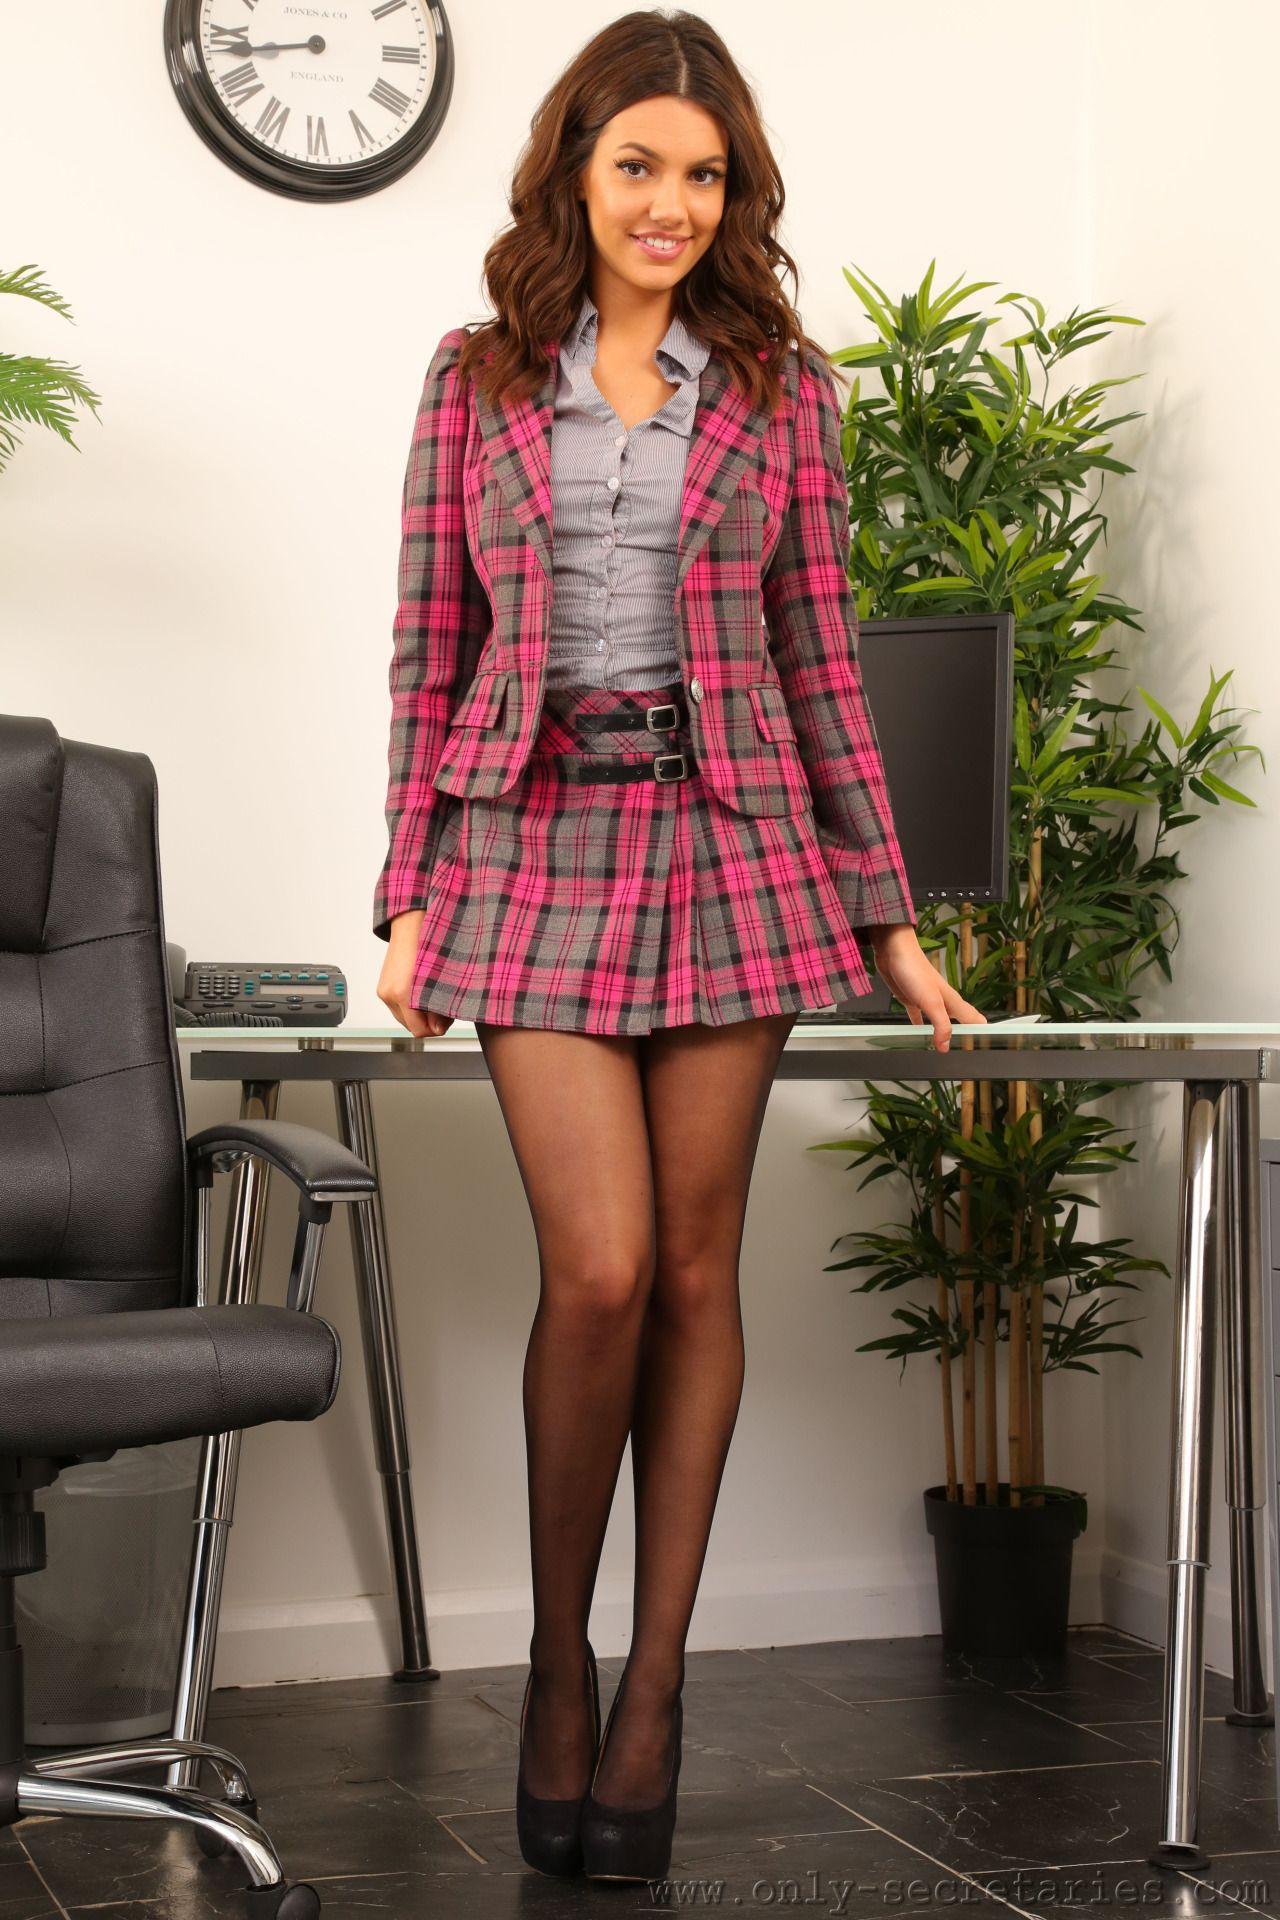 Hot secretary teen, teen young porn x